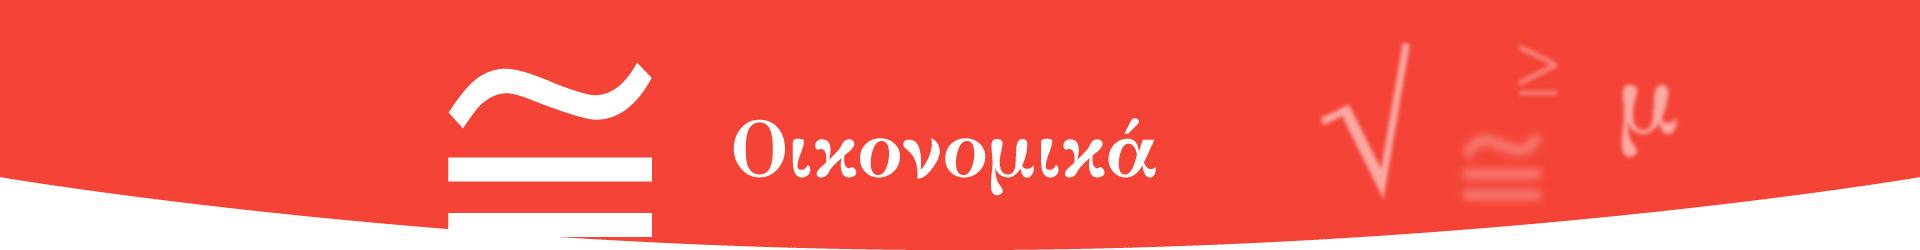 banners oikonomika